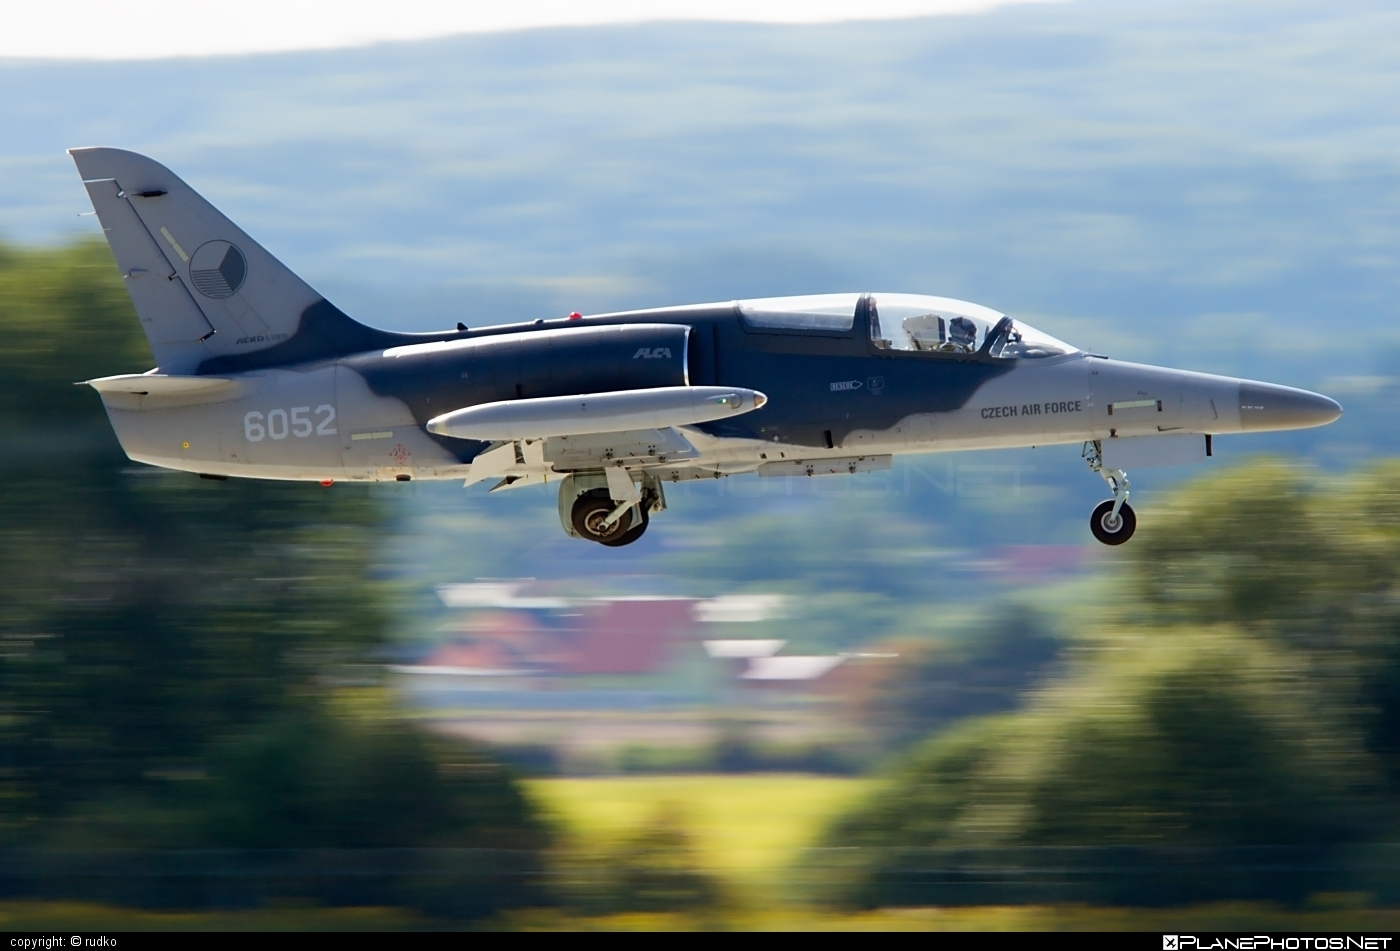 Aero L-159A Alca - 6052 operated by Vzdušné síly AČR (Czech Air Force) #aero #aerol159 #aerol159aalca #aerol159alca #czechairforce #l159 #l159a #l159aalca #l159alca #vzdusnesilyacr